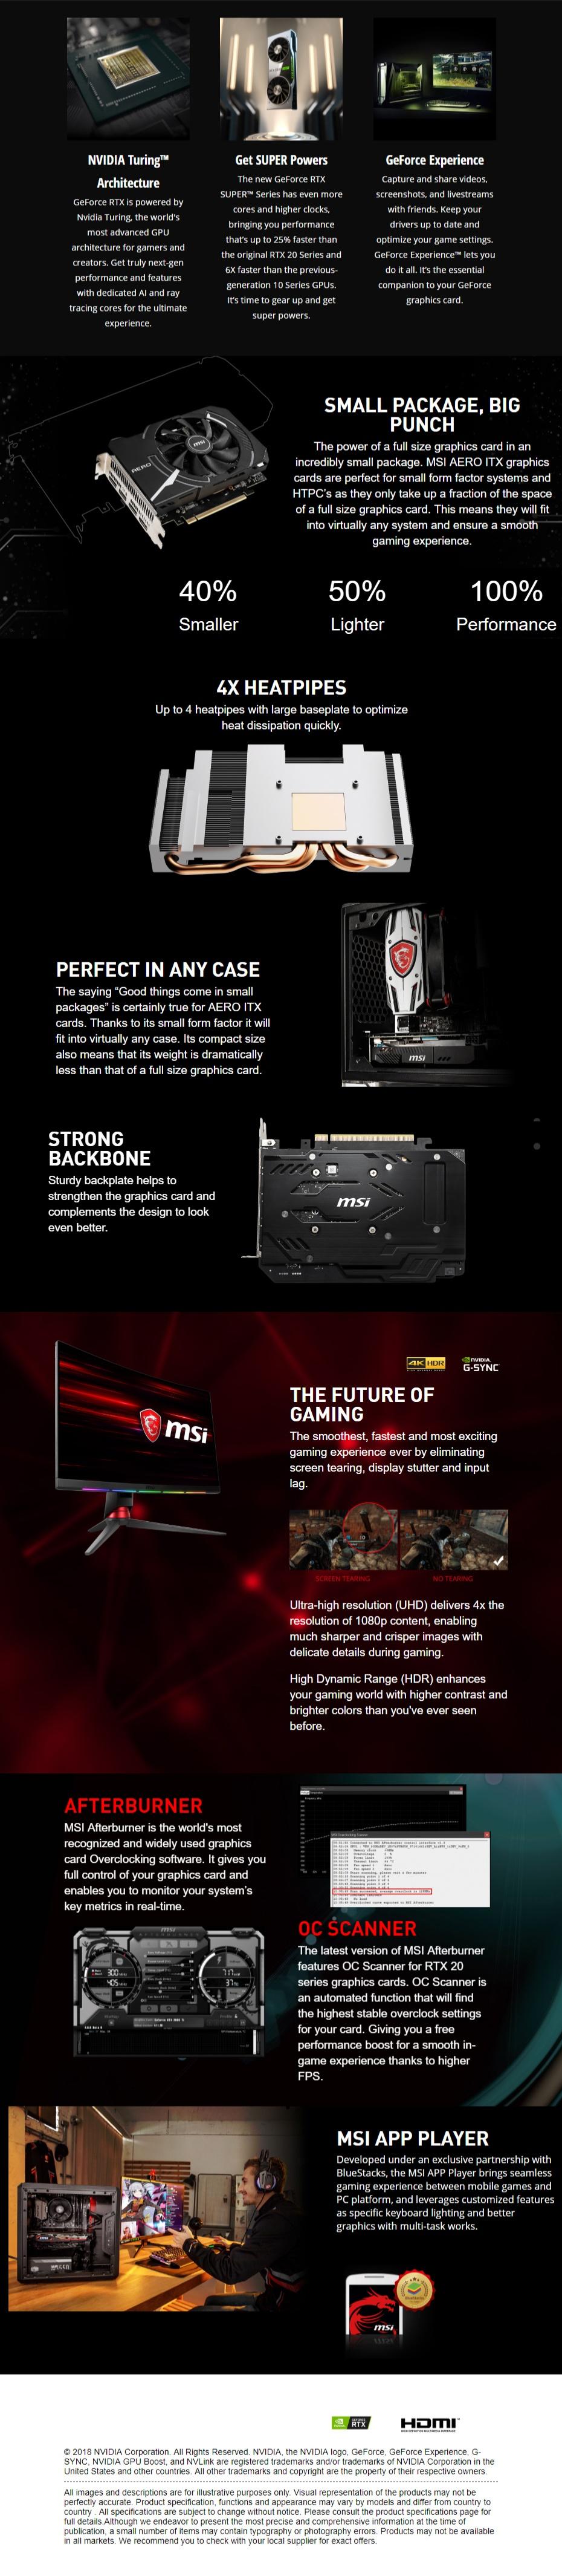 MSI GeForce RTX 2060 Super Aero ITX 8G Graphic Card